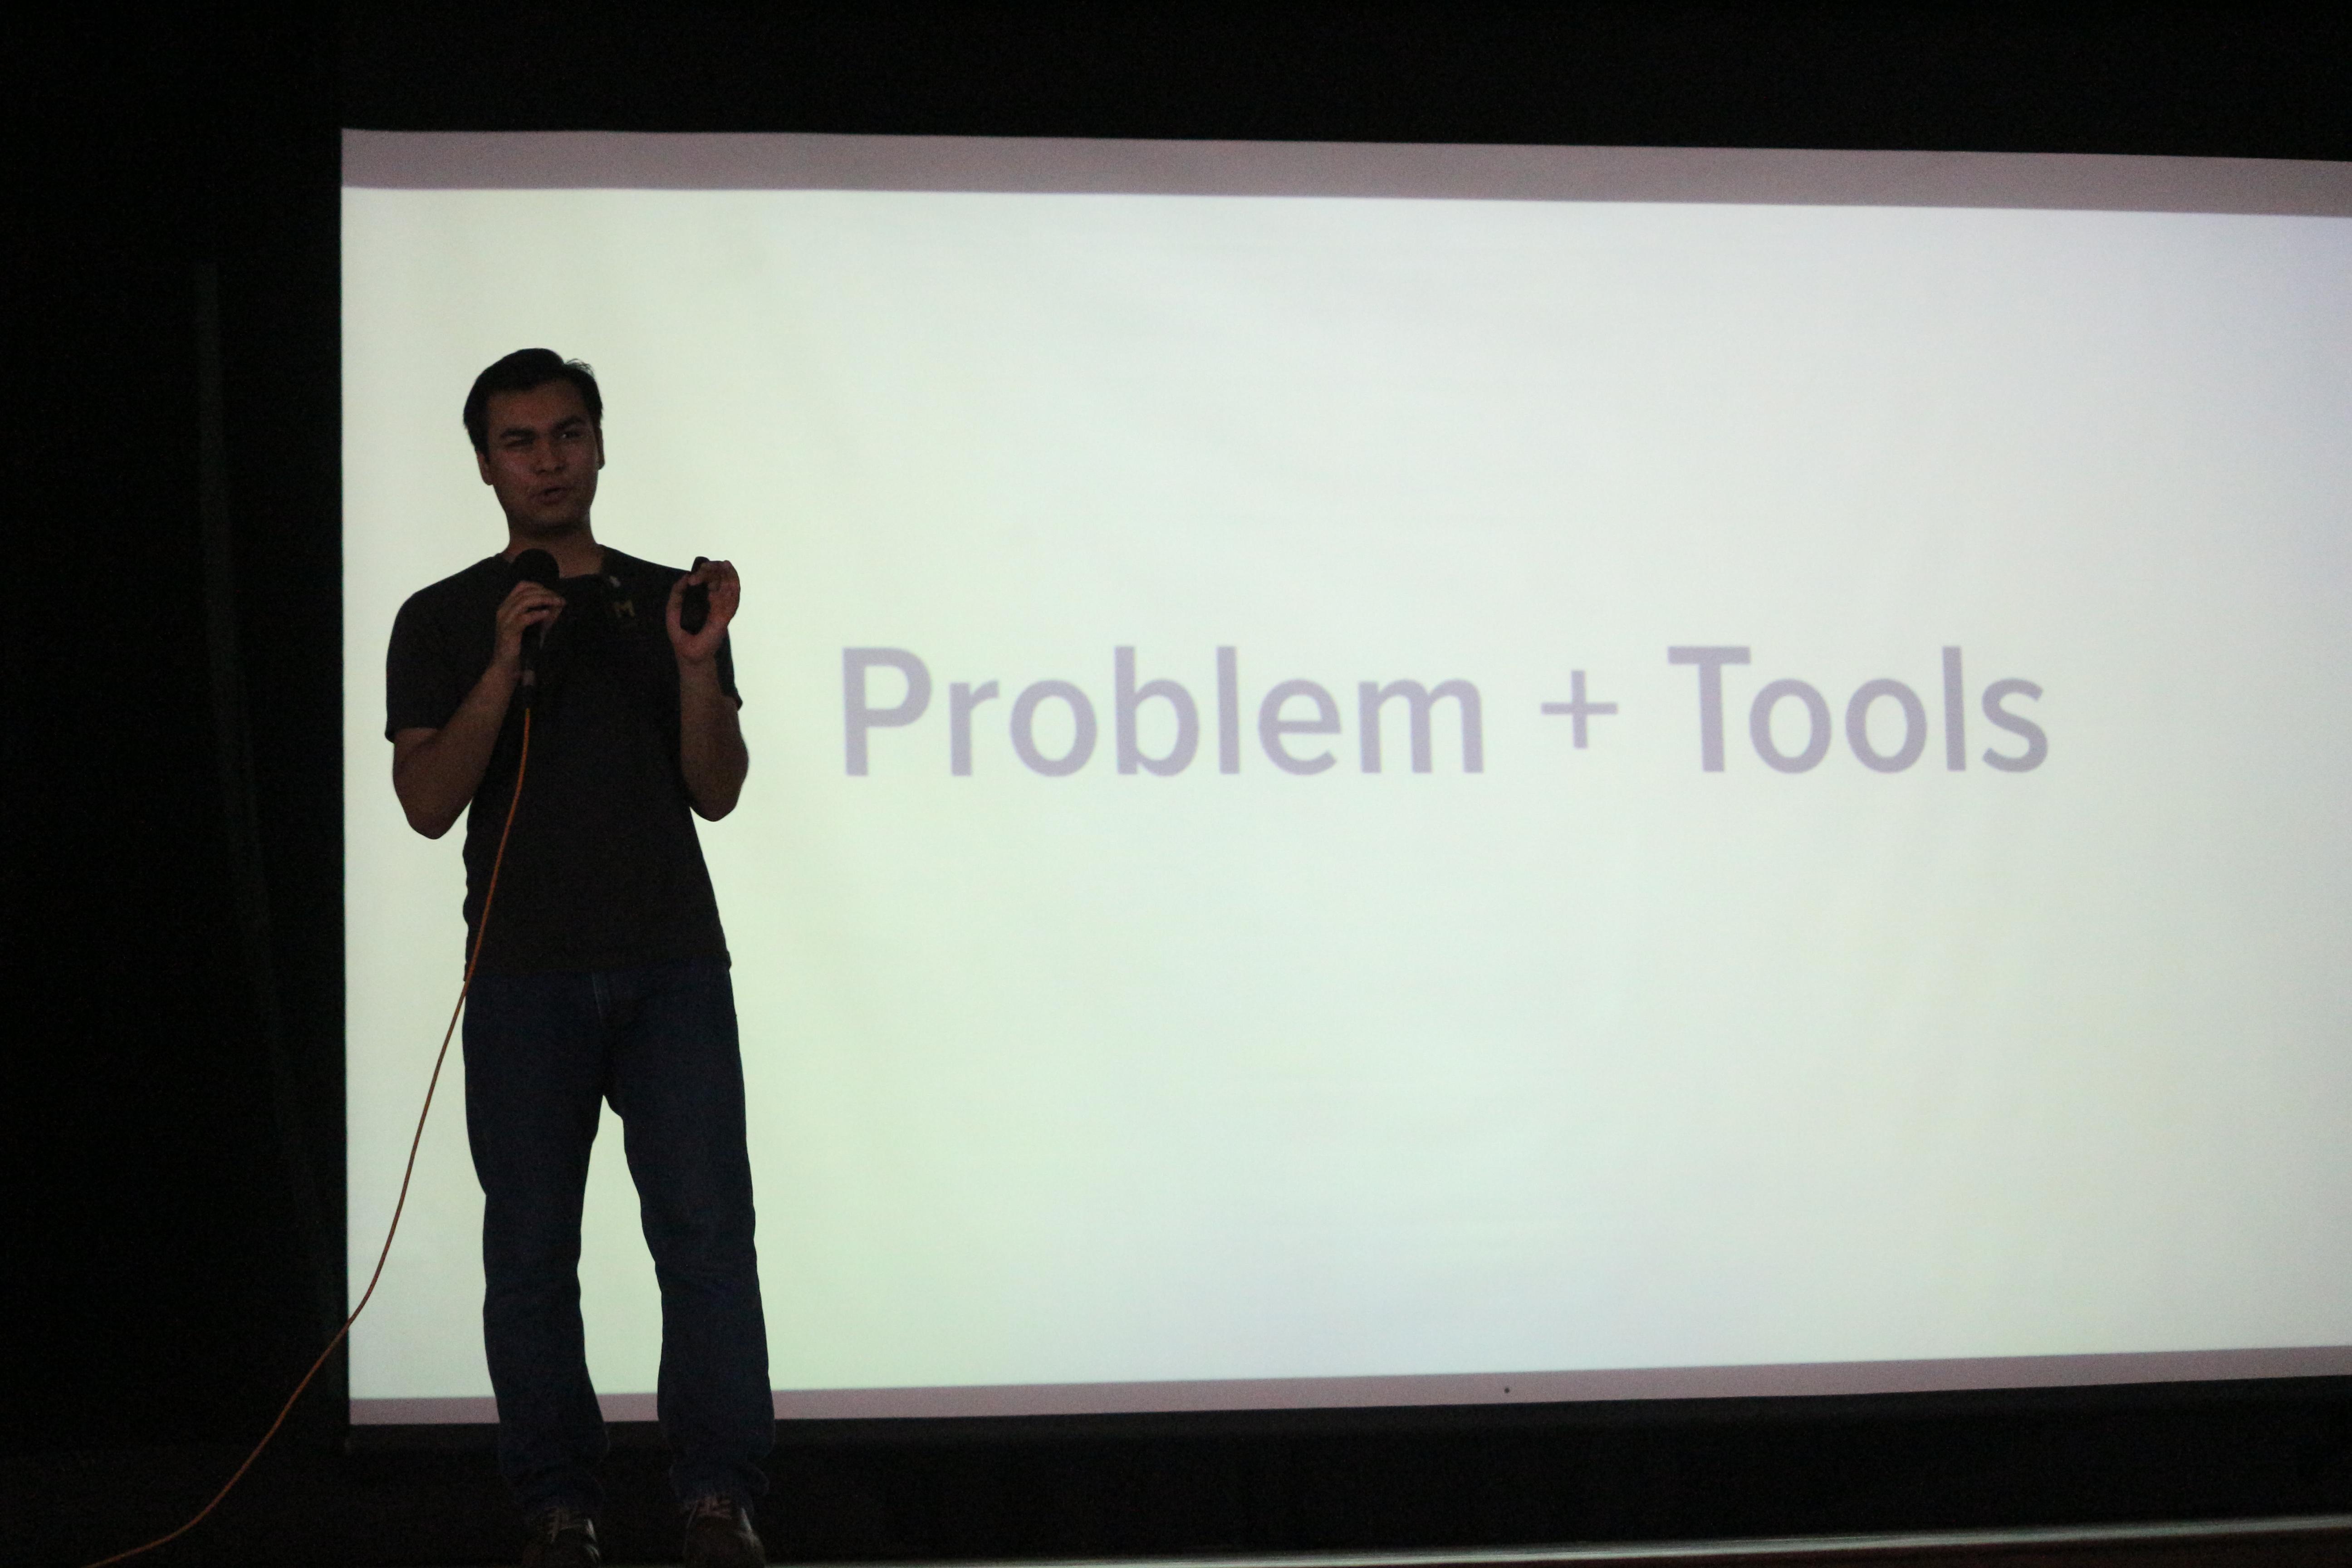 Anand Chowdhary explaining Problems + Tools slide